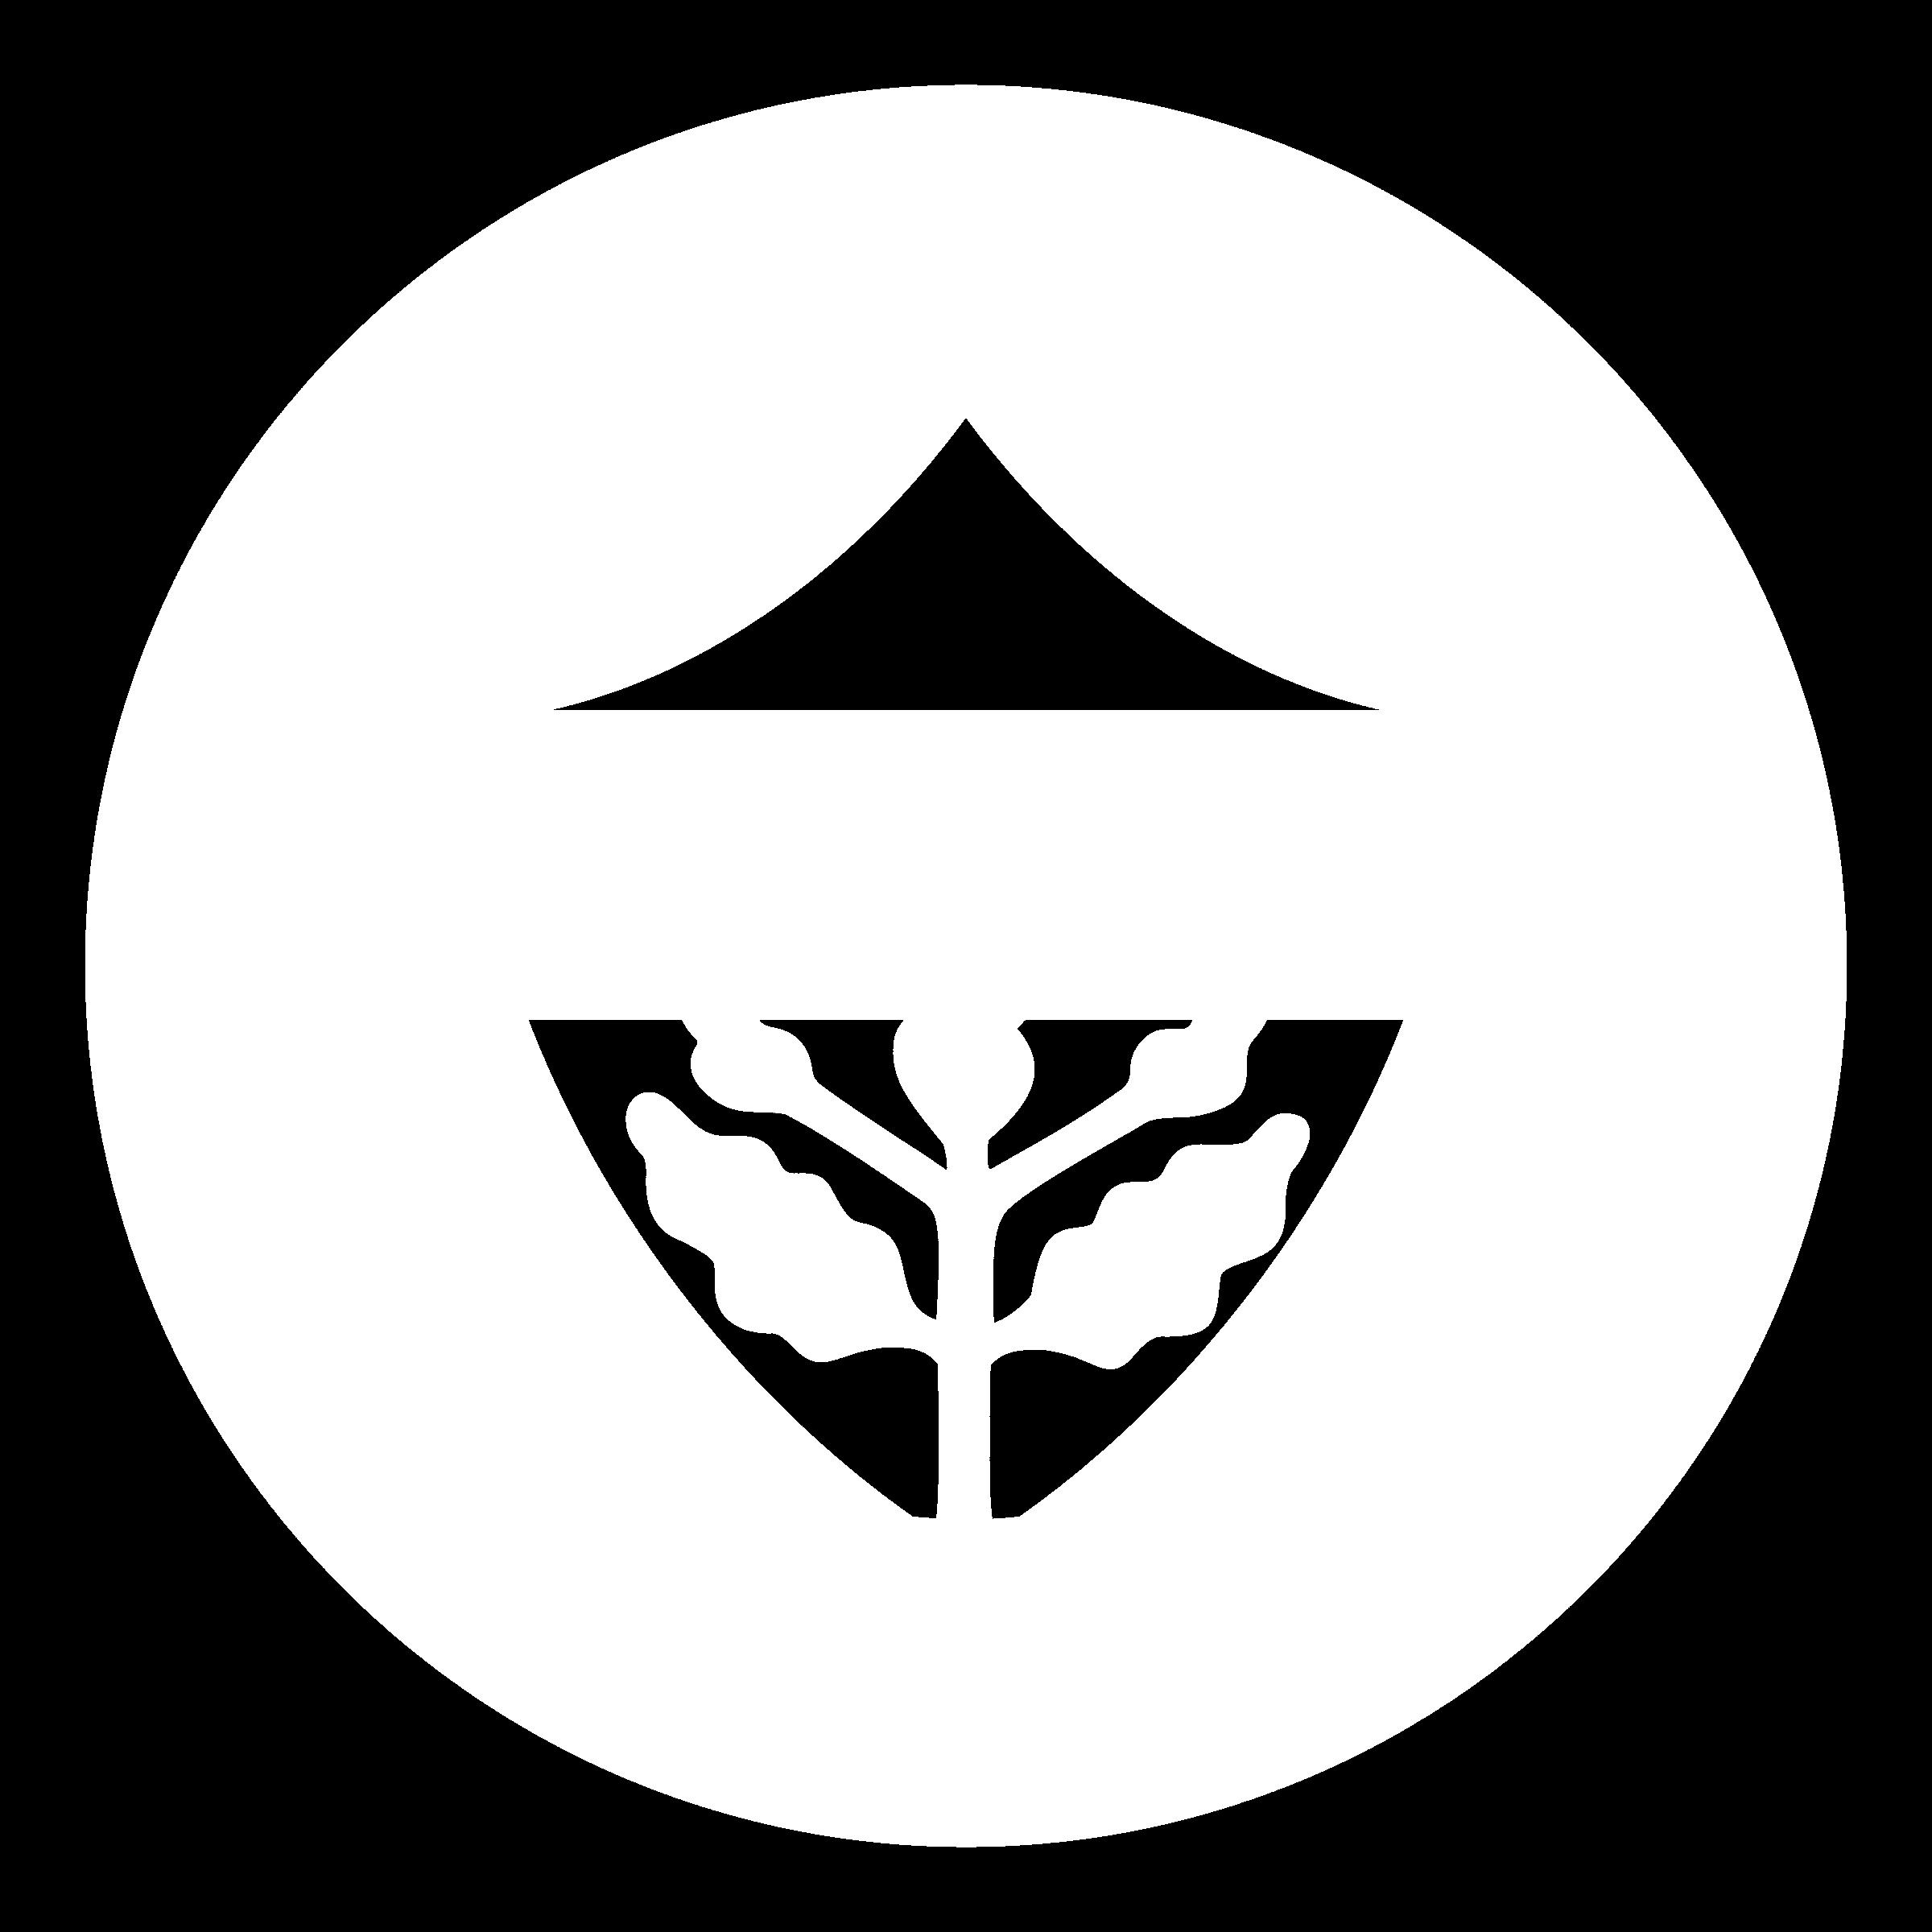 Fenerbahce logo clipart image royalty free download Fenerbahce Spor Kulubu Logo PNG Transparent & SVG Vector - Freebie ... image royalty free download